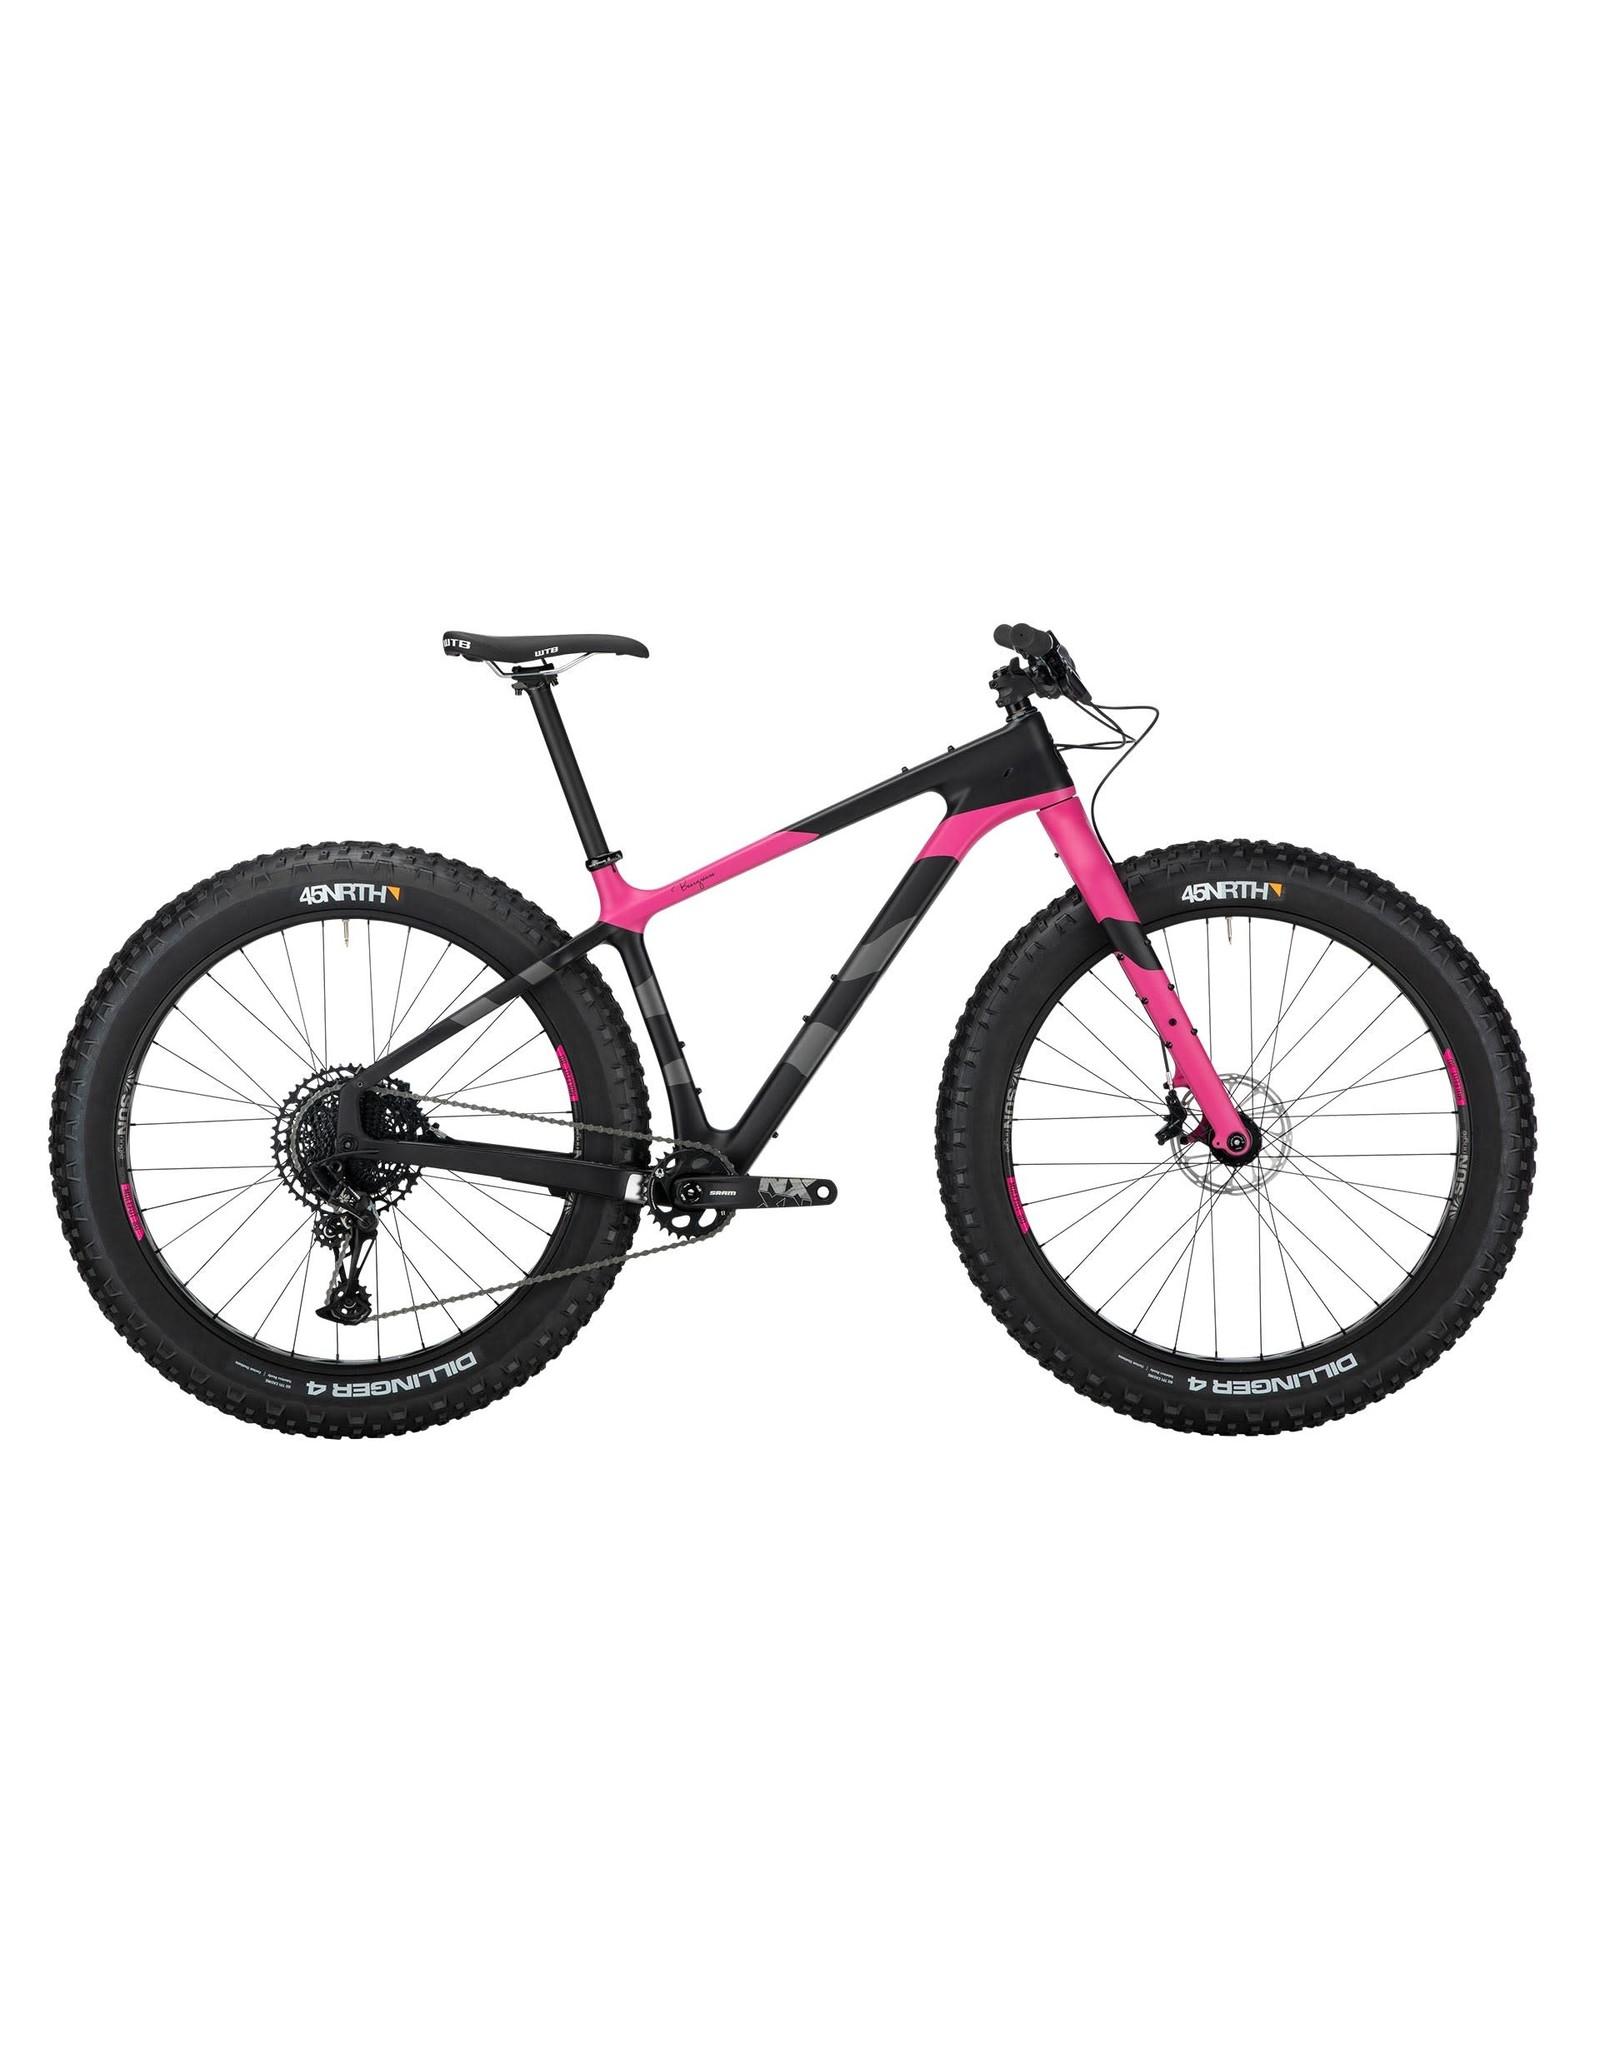 SALSA 2020 Beargrease CB NX Eagle small black/pink